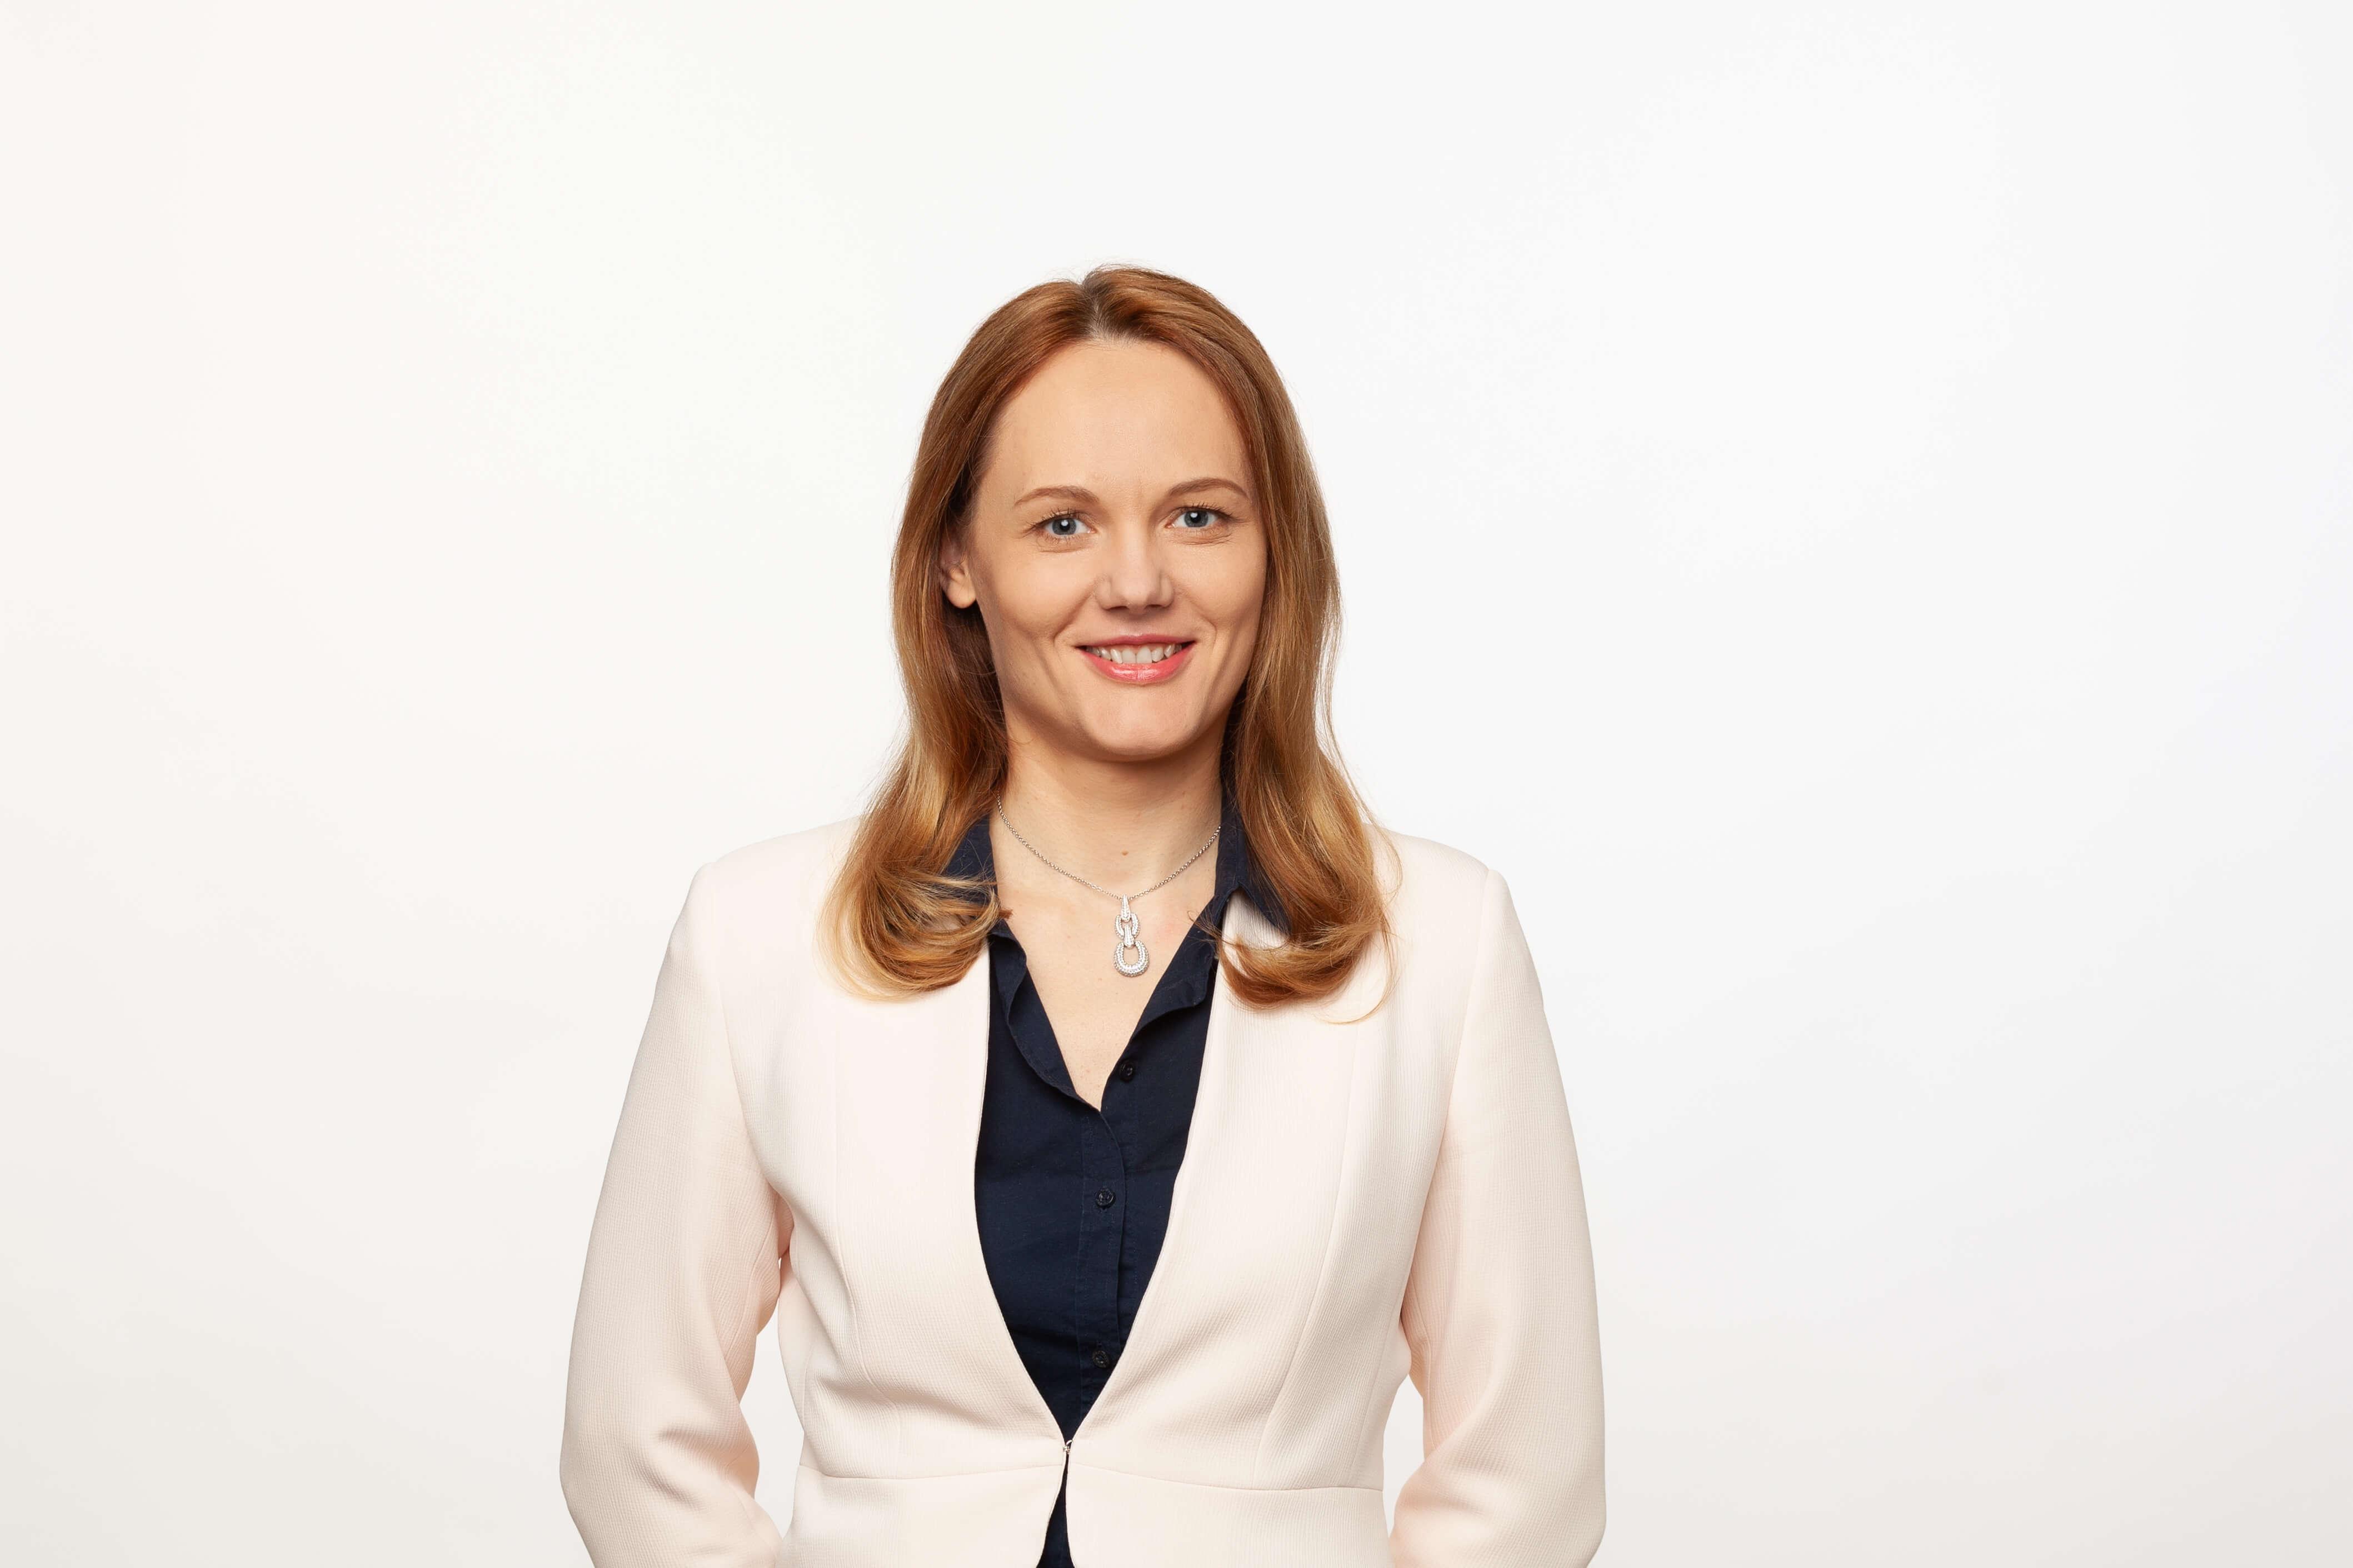 Indrė Liutkevičienė